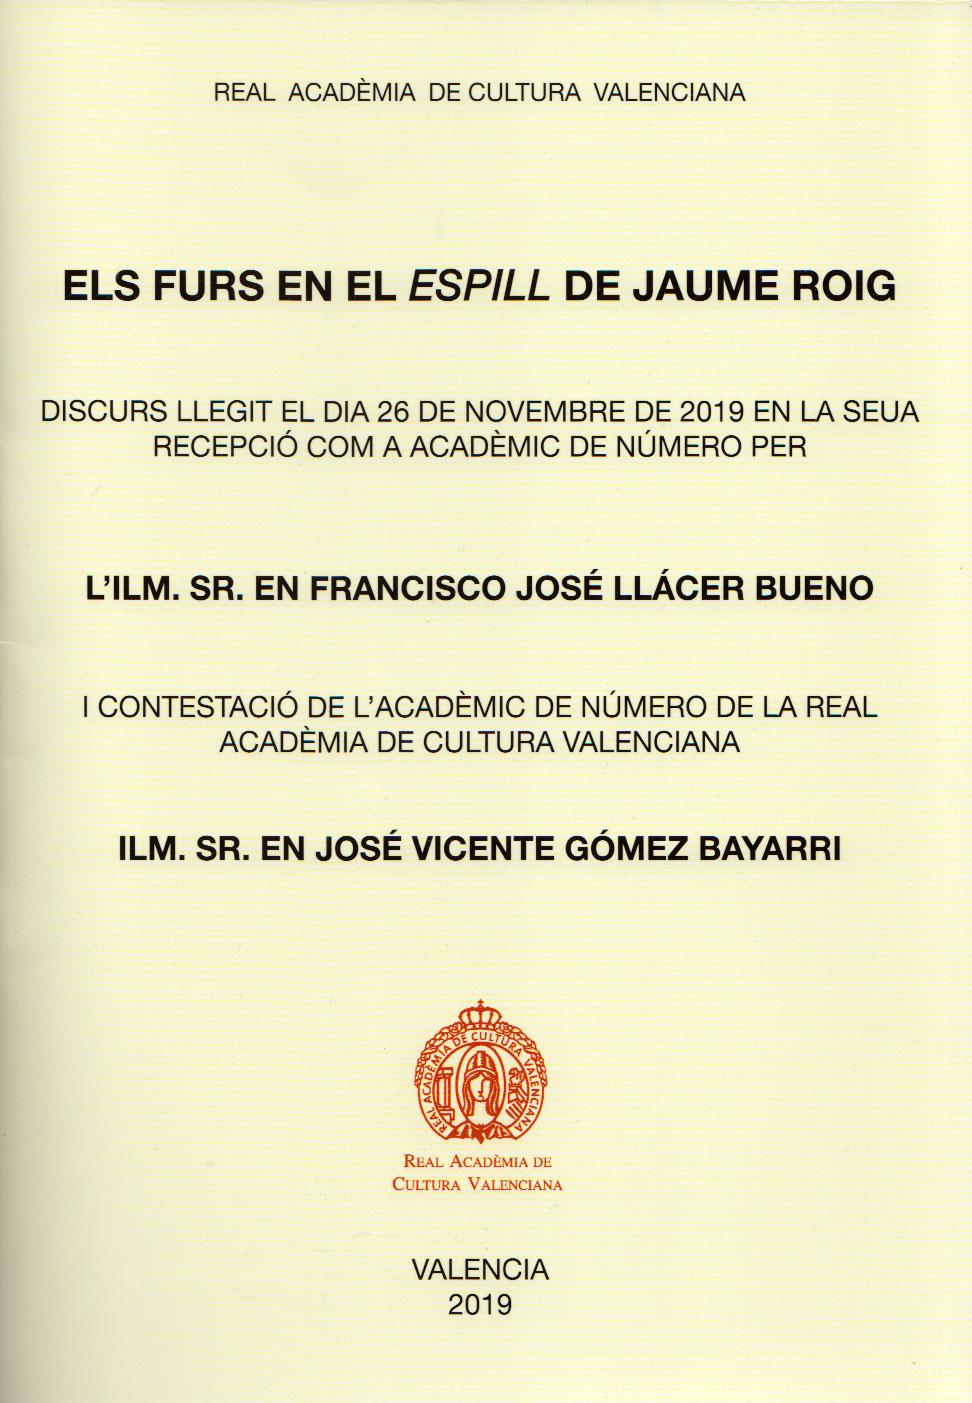 Discurso Francisco Llácer Bueno